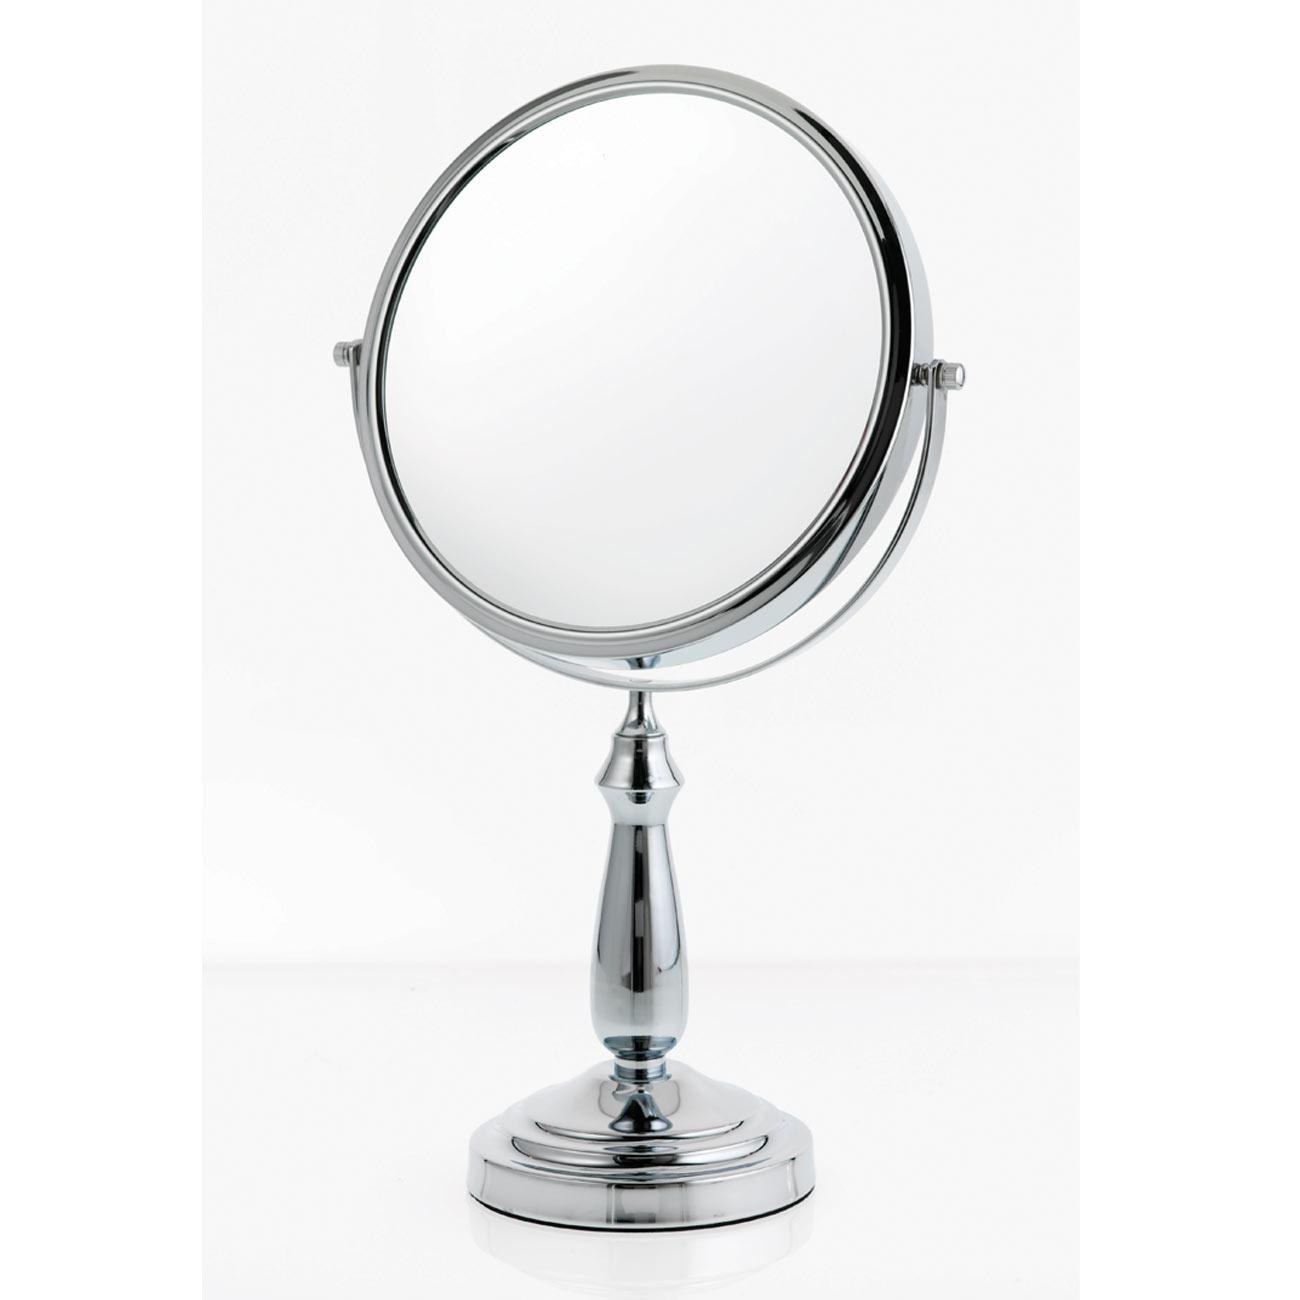 Danielle Large 9 inch Vanity Mirror - Chrome - 10X